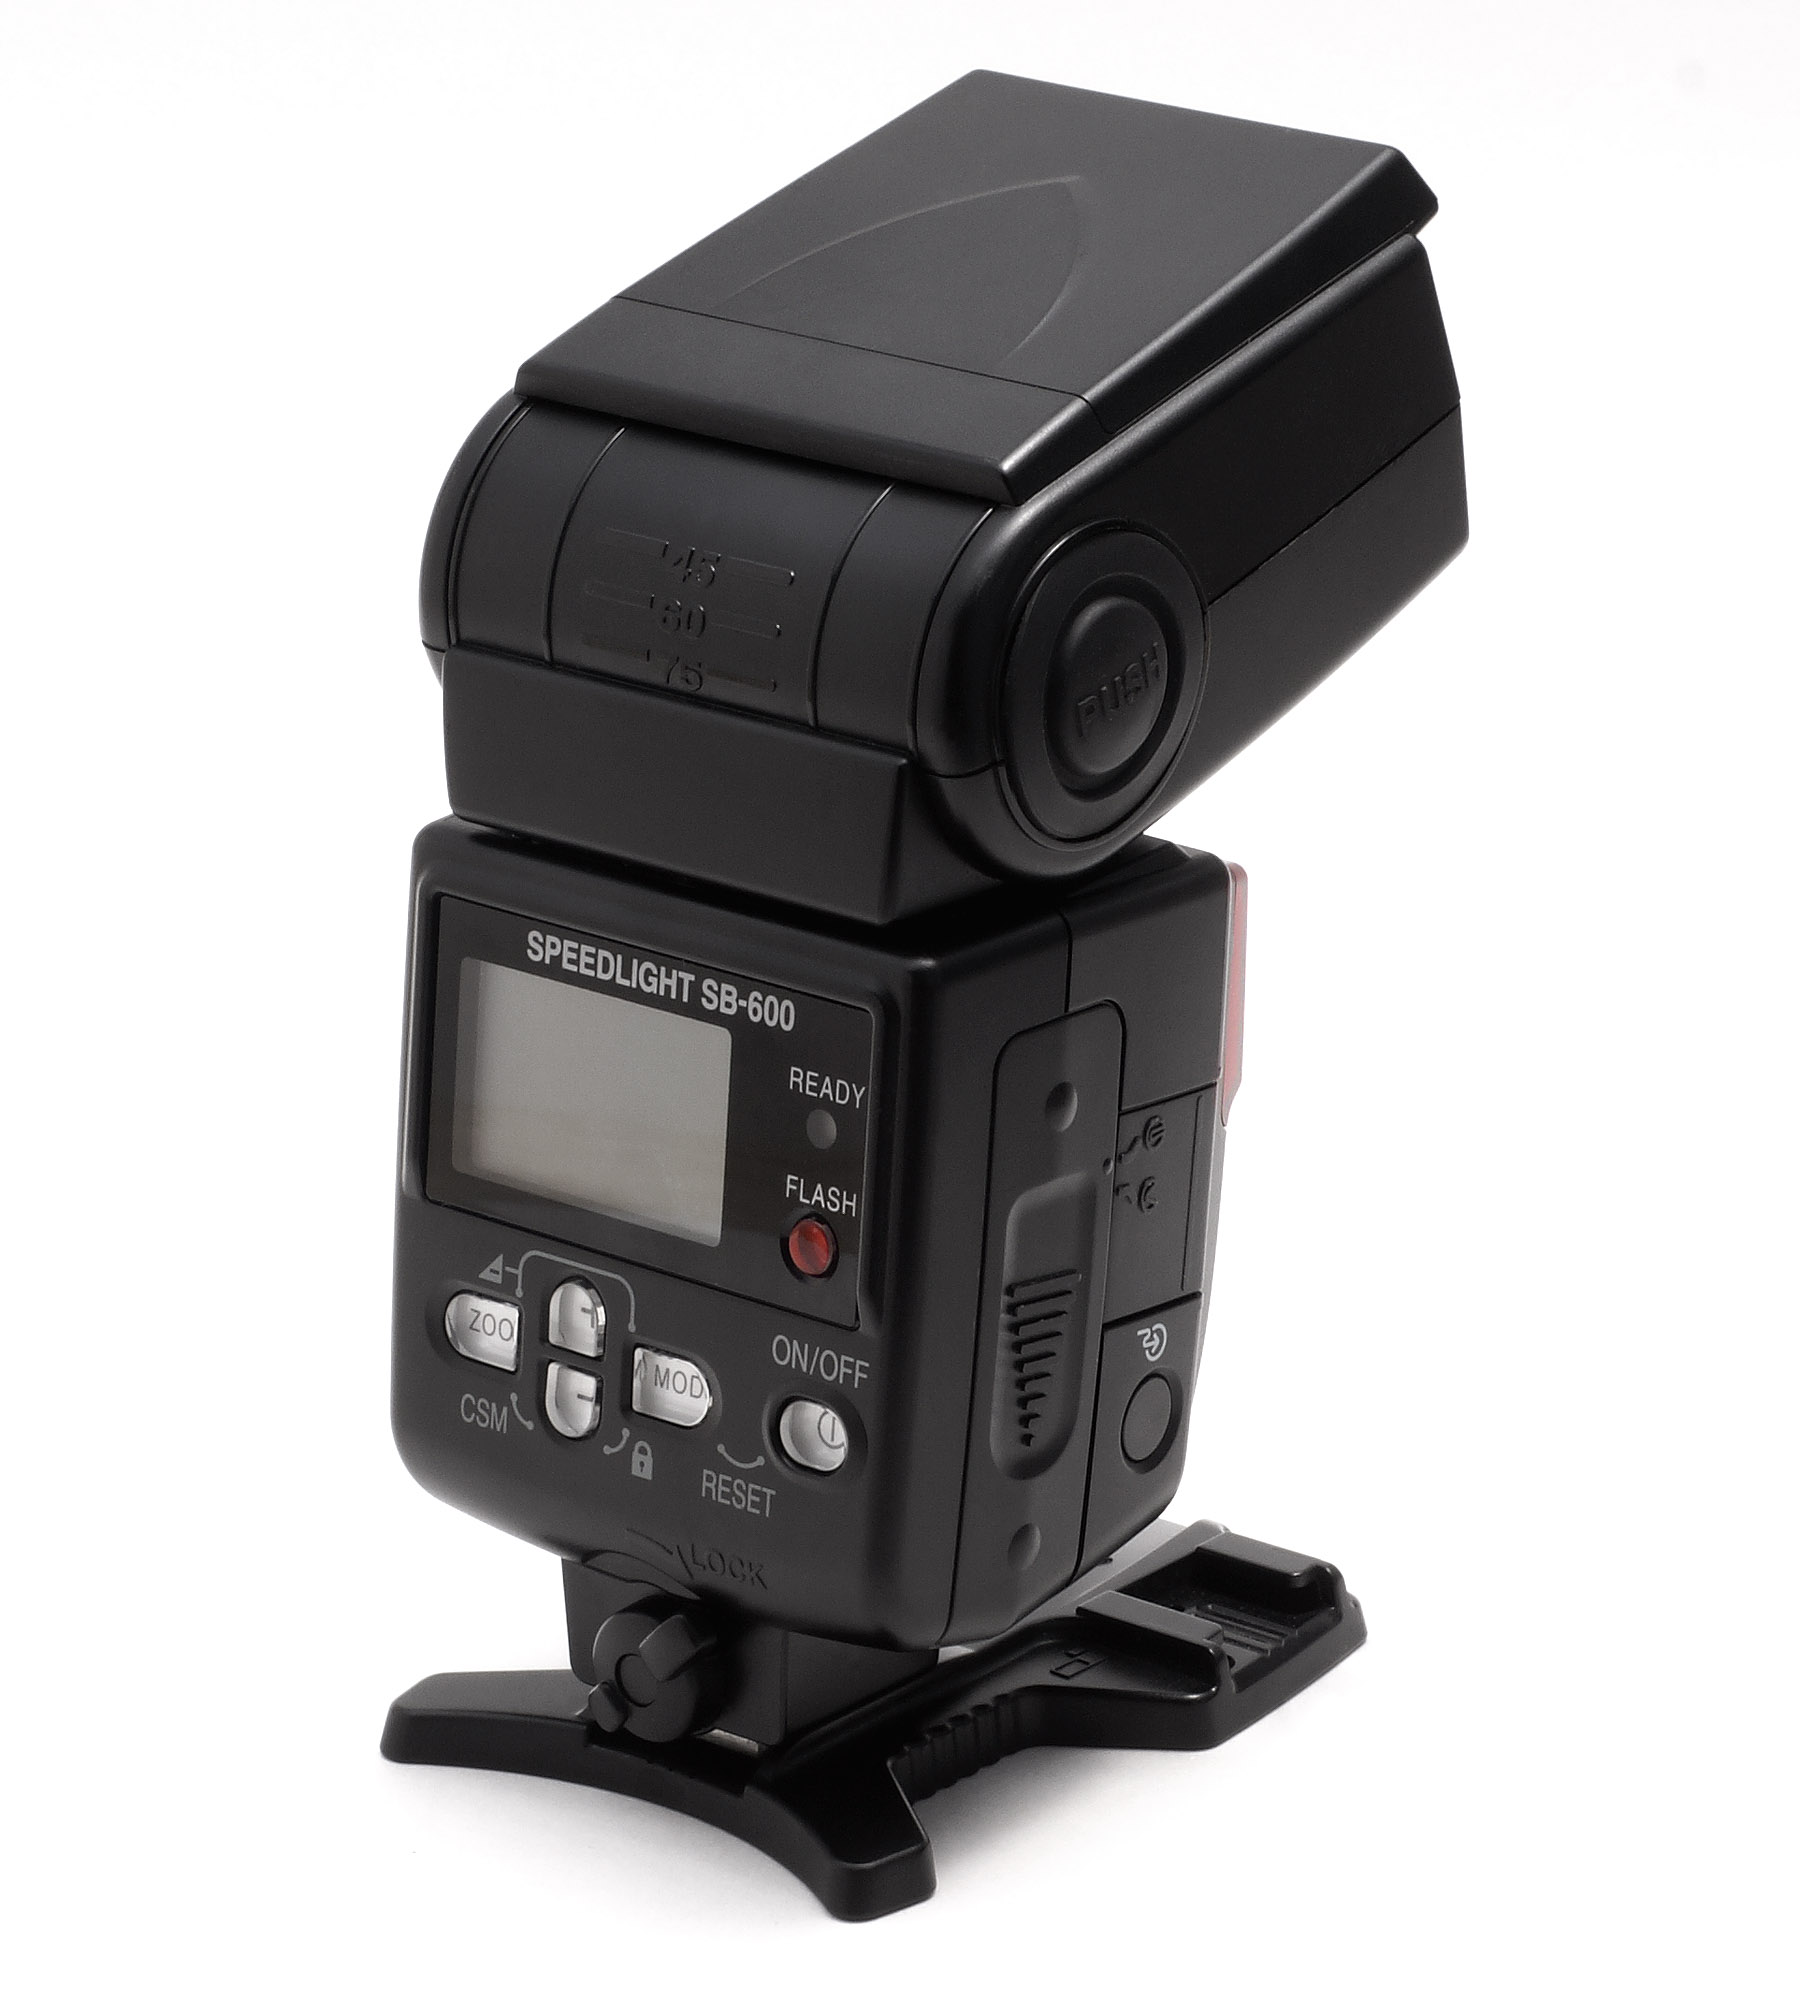 Nikon Speedlight SB-700 vs. Nikon Speedlight SB-600: front panel ...